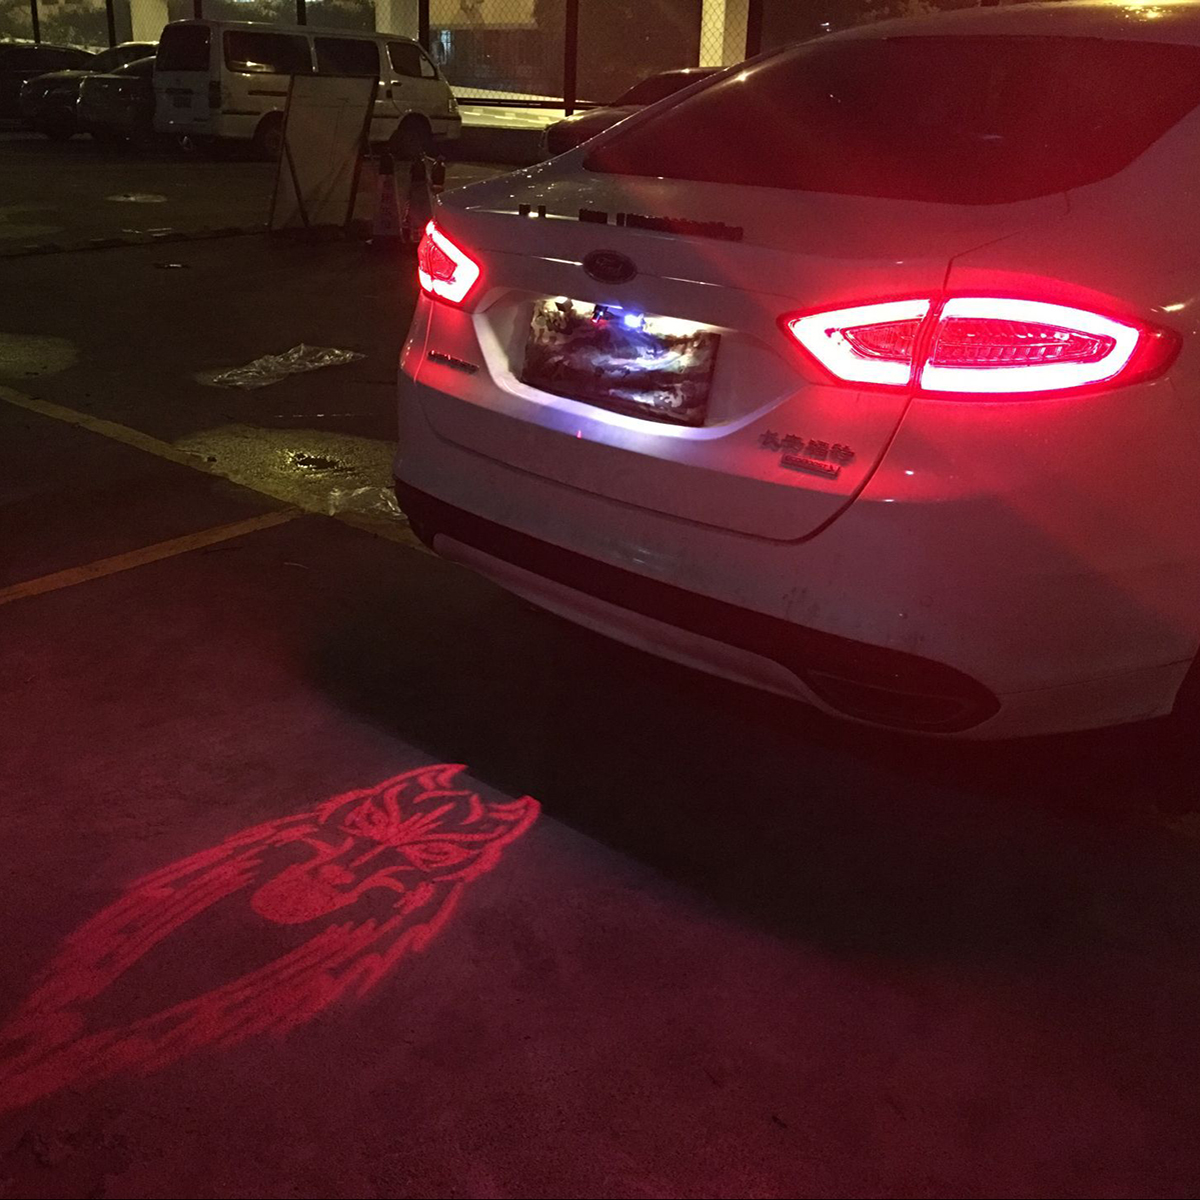 Car Tail Led Light Anti Collision Rear-end Fog Lamp Rearing Warning for Kia K5 Ceed Sorento K2 Rio K3 Forte Cerato Sportage Logo<br><br>Aliexpress